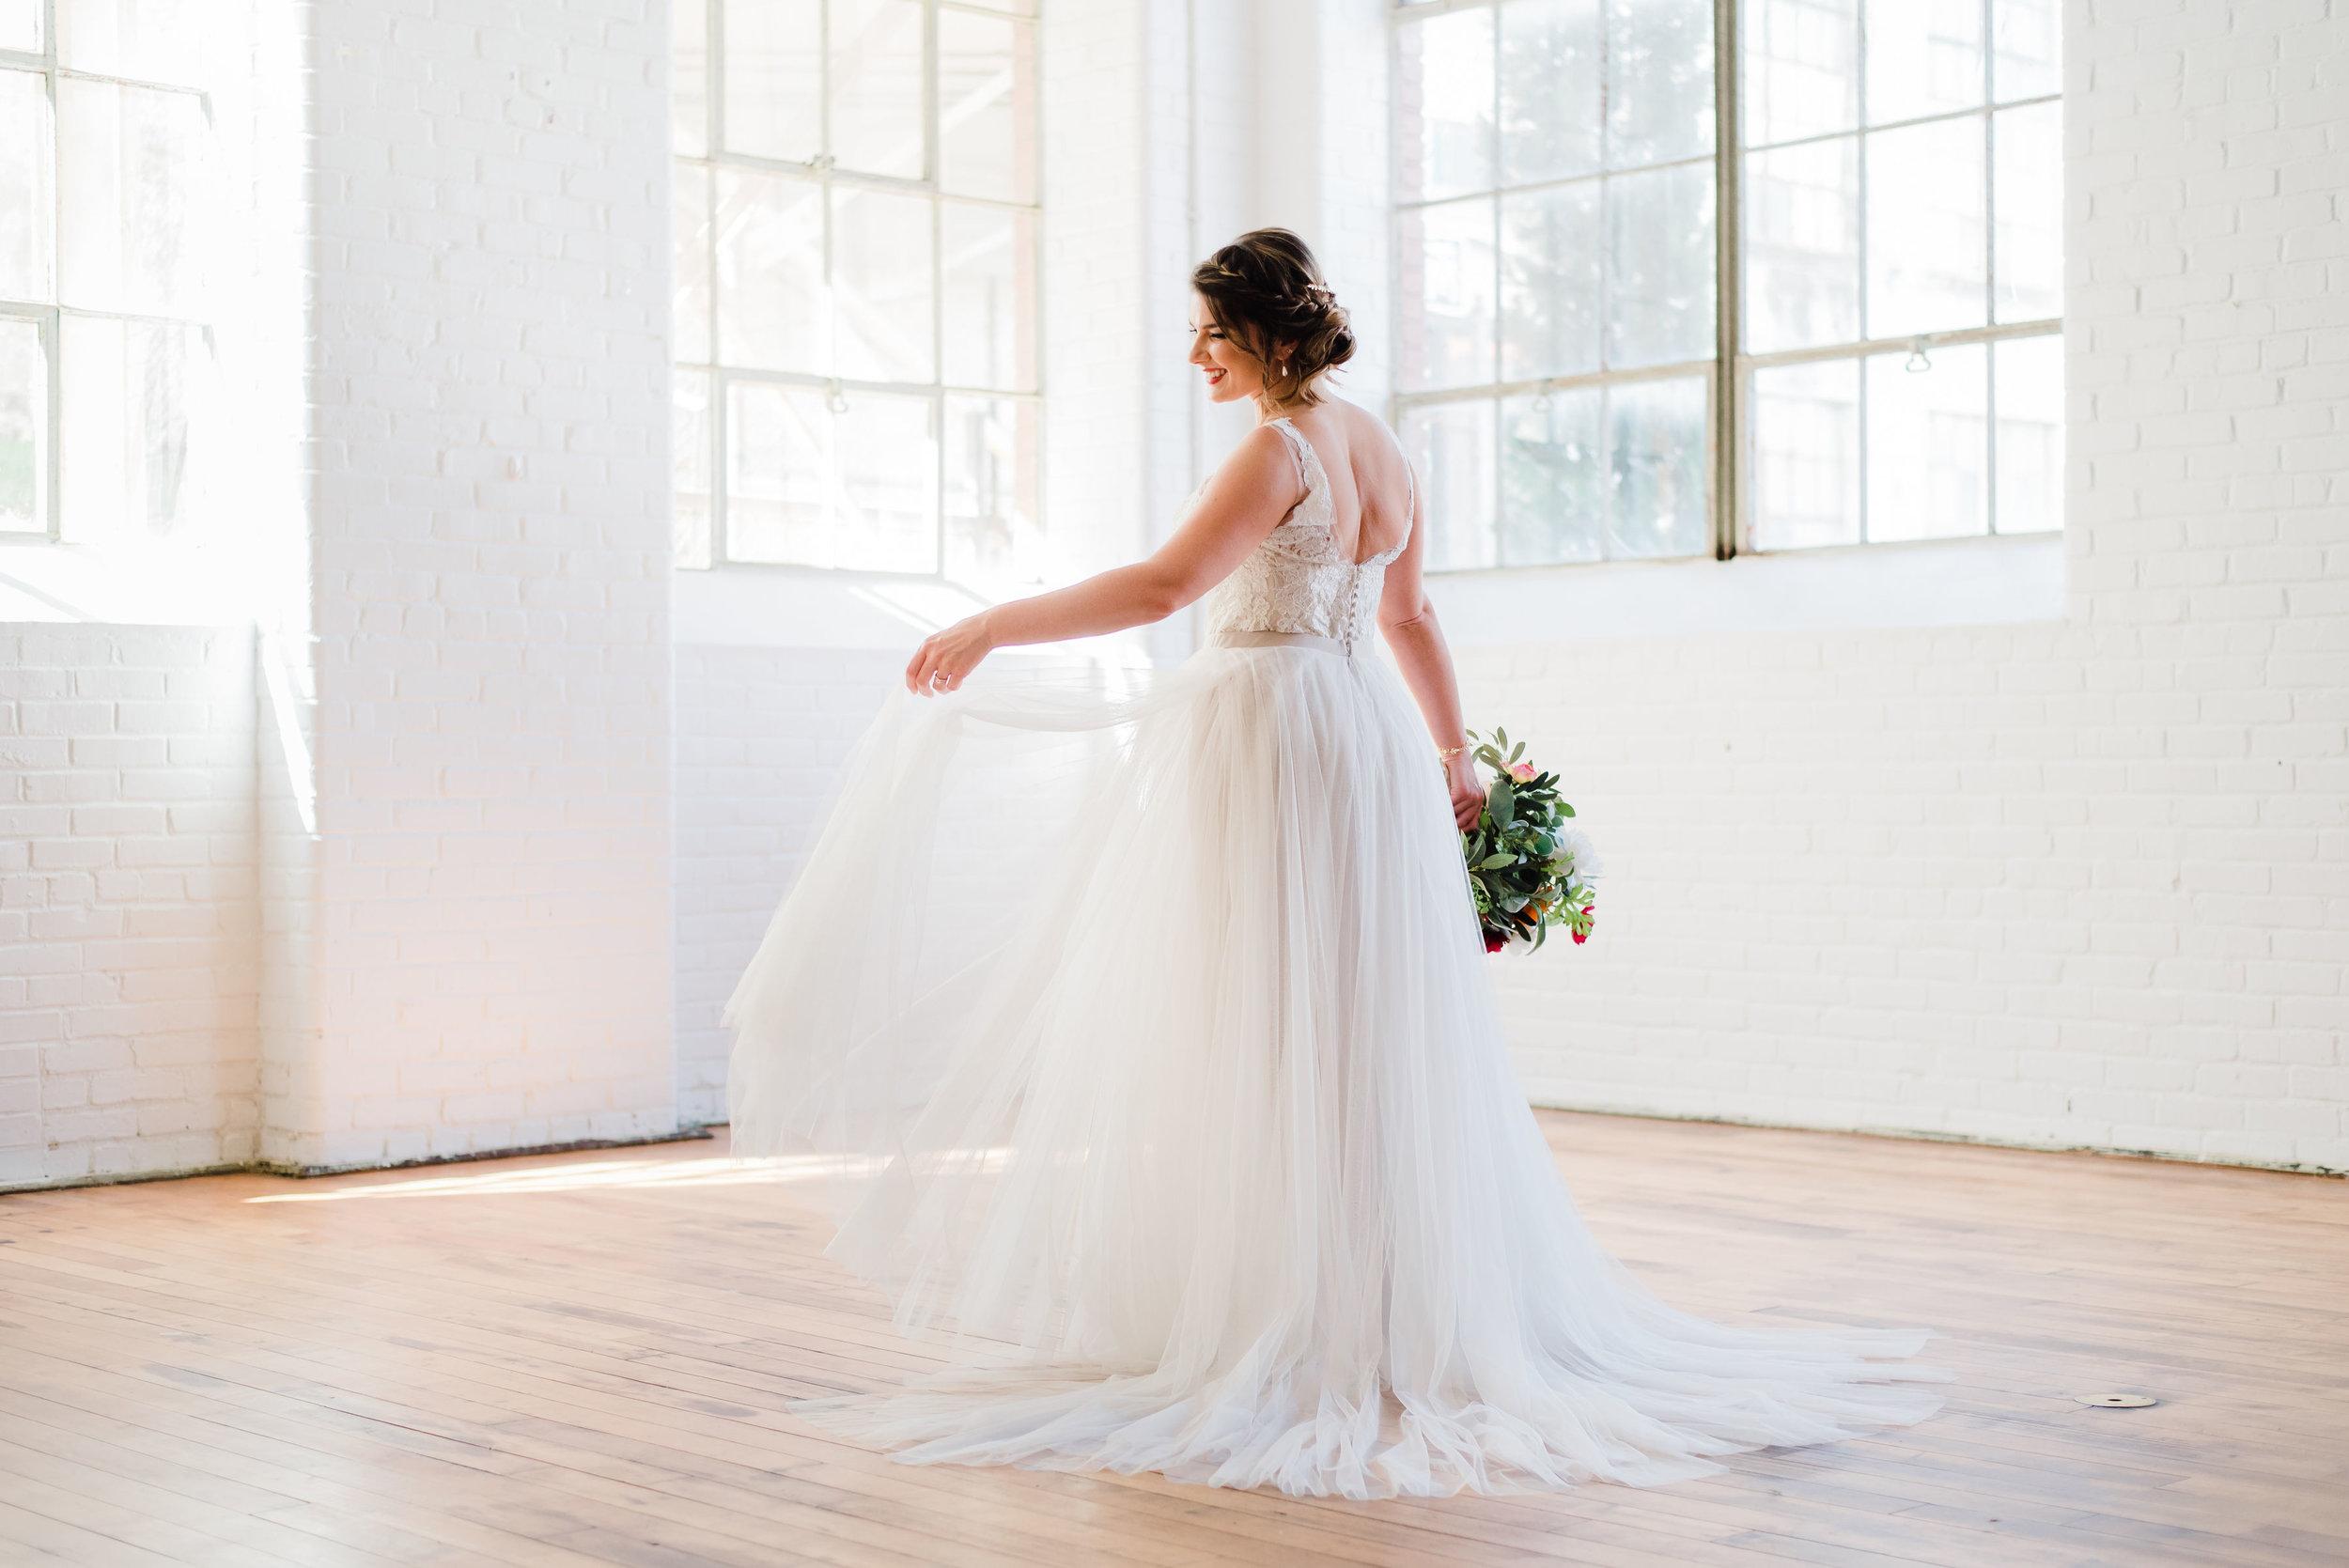 TaylorAdams_bridals-61.jpg